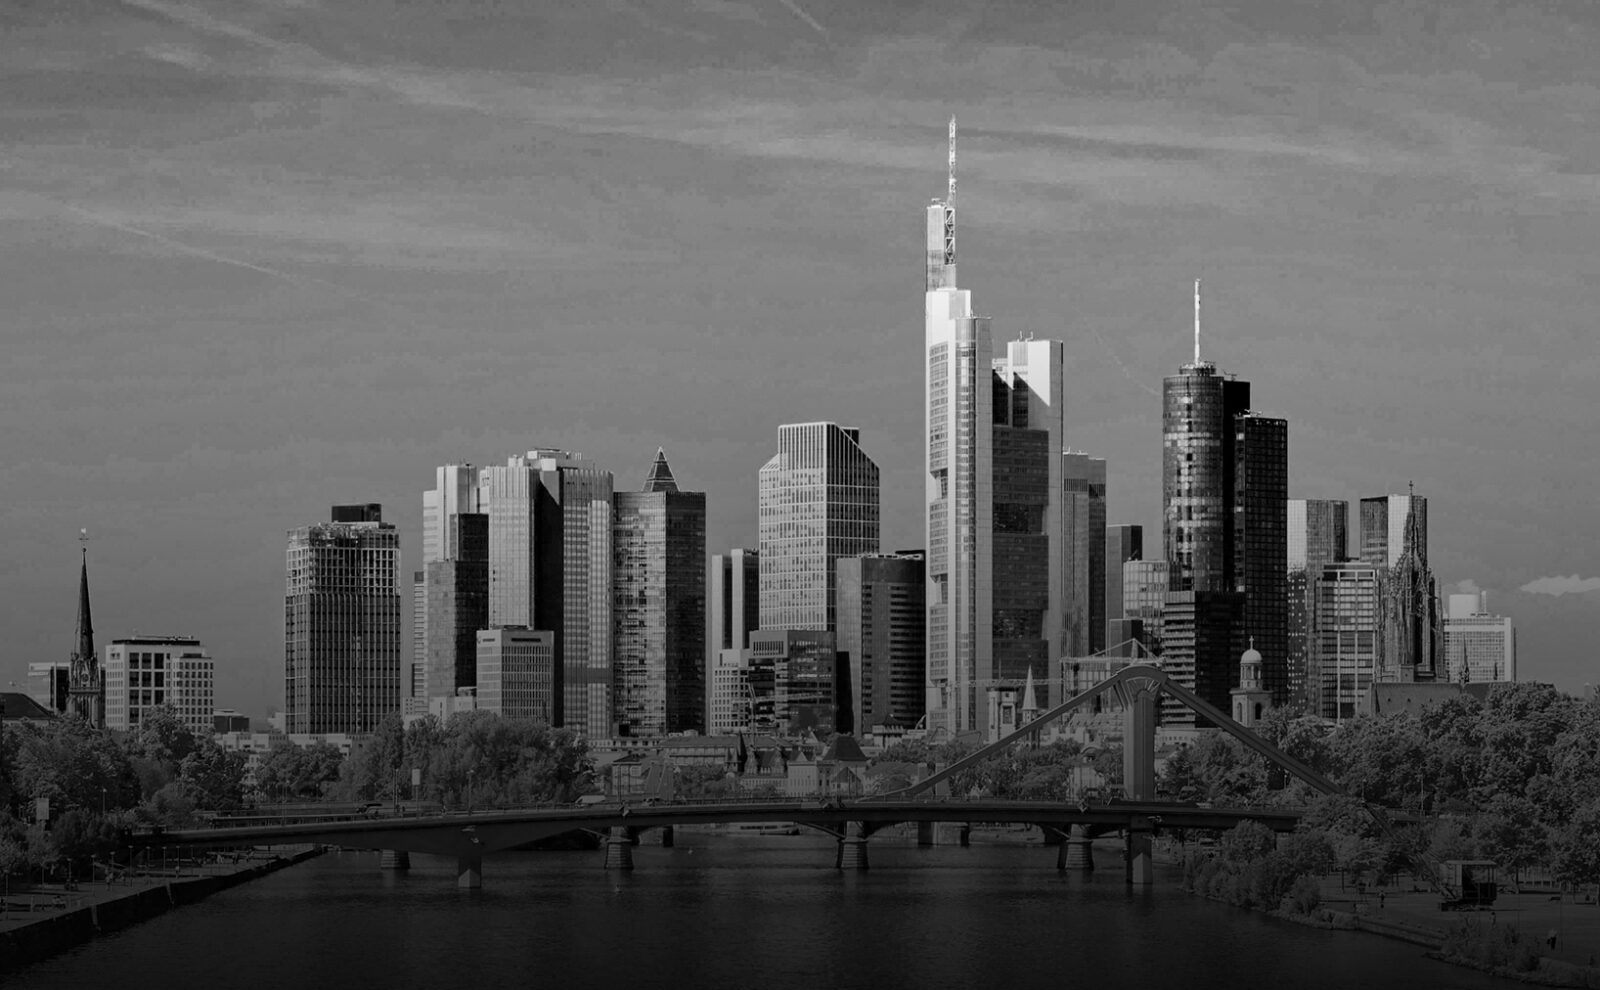 https://www.strategy-action.com/wp-content/uploads/sites/3/2021/05/Frankfurt_nb2-scaled.jpg